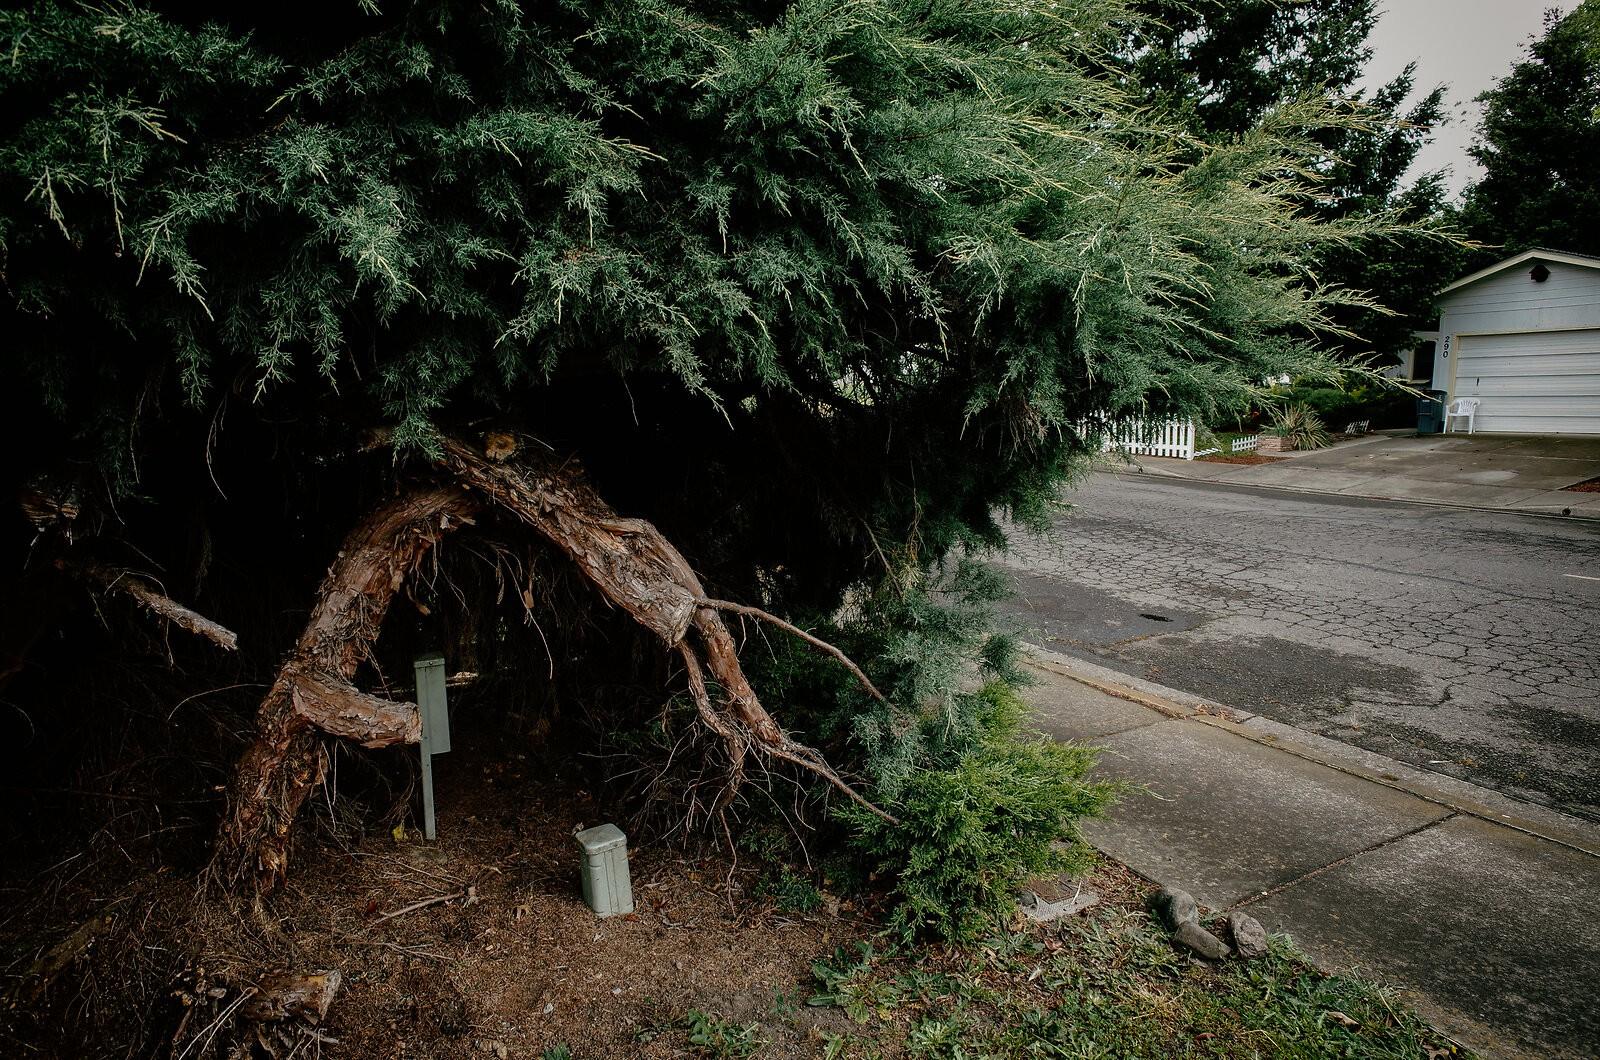 GRII_May14_Suburban_trees.jpg